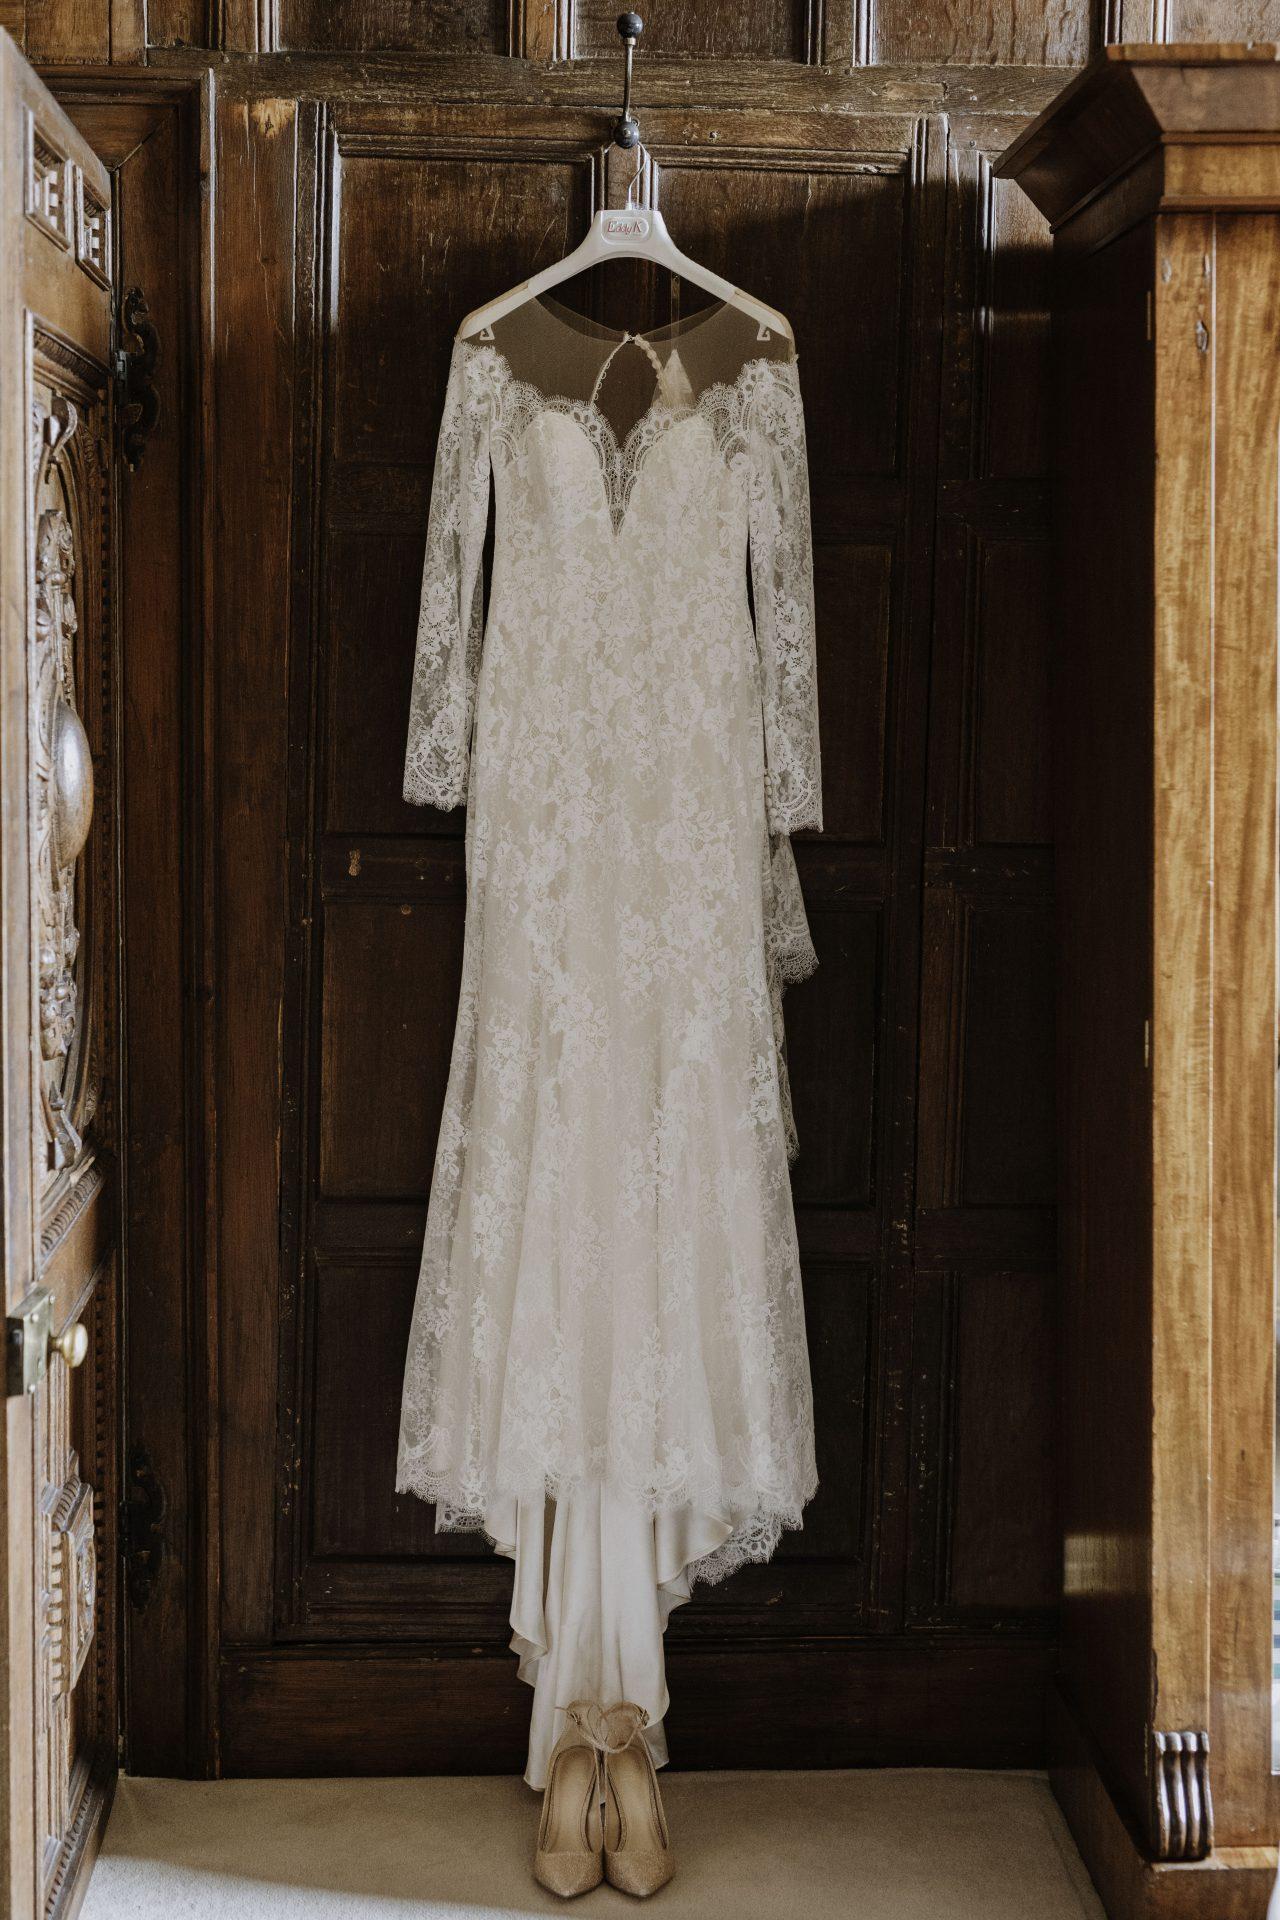 lace wedding dress hanging up